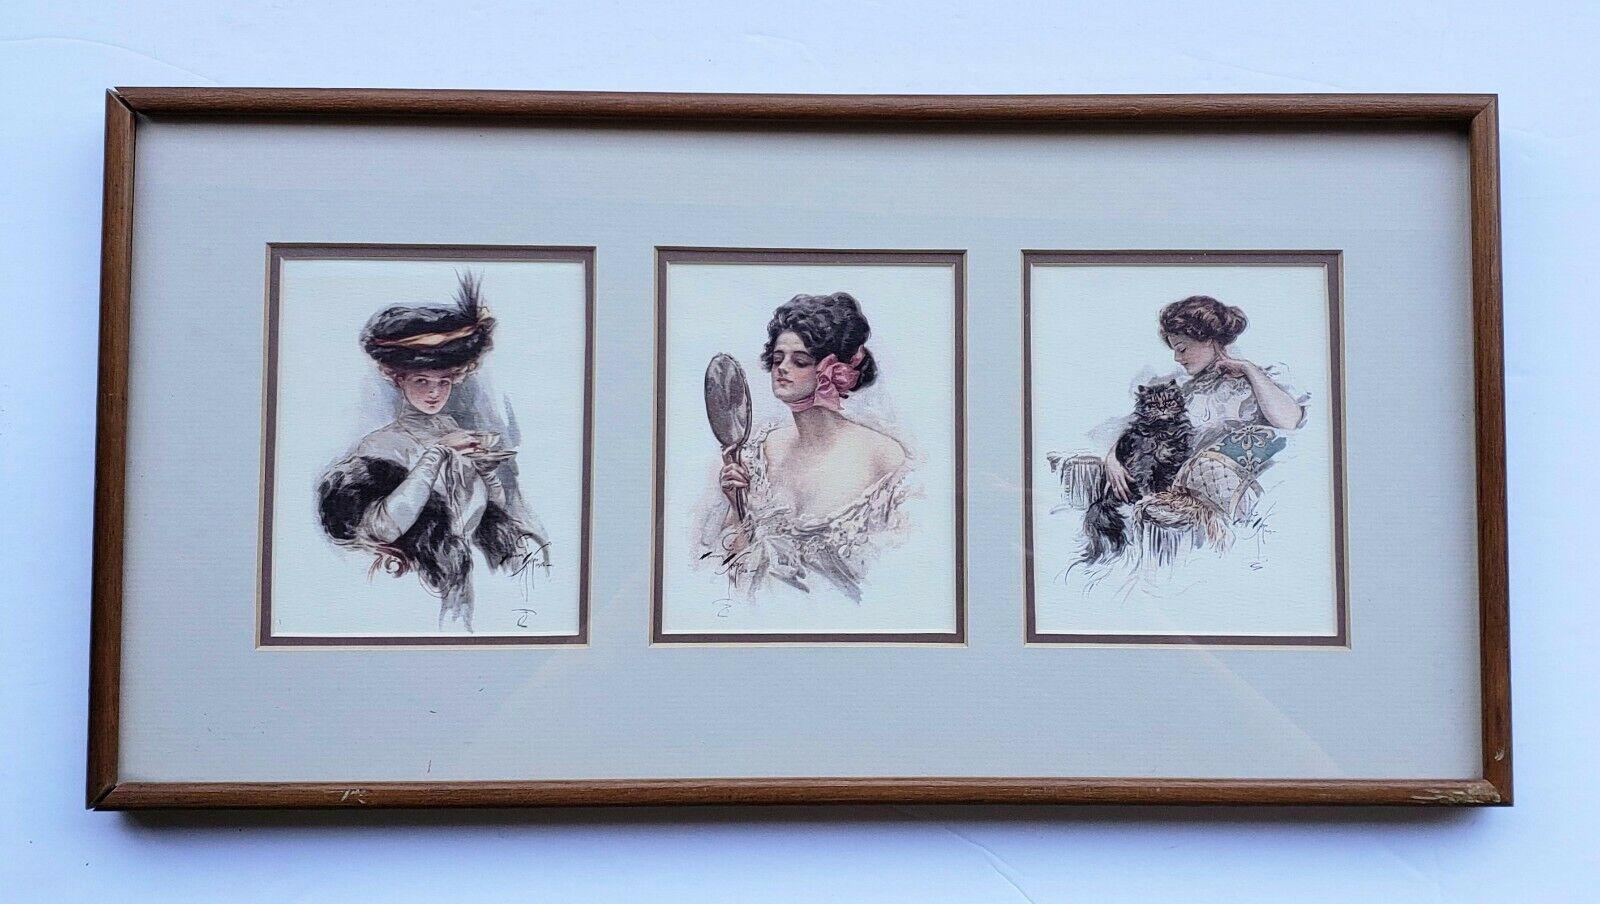 VINTAGE 1977 FRAMED HARRISON FISHER EDWARDIAN PRINTS (FISHER GIRLS) WALL ART on eBay thumbnail